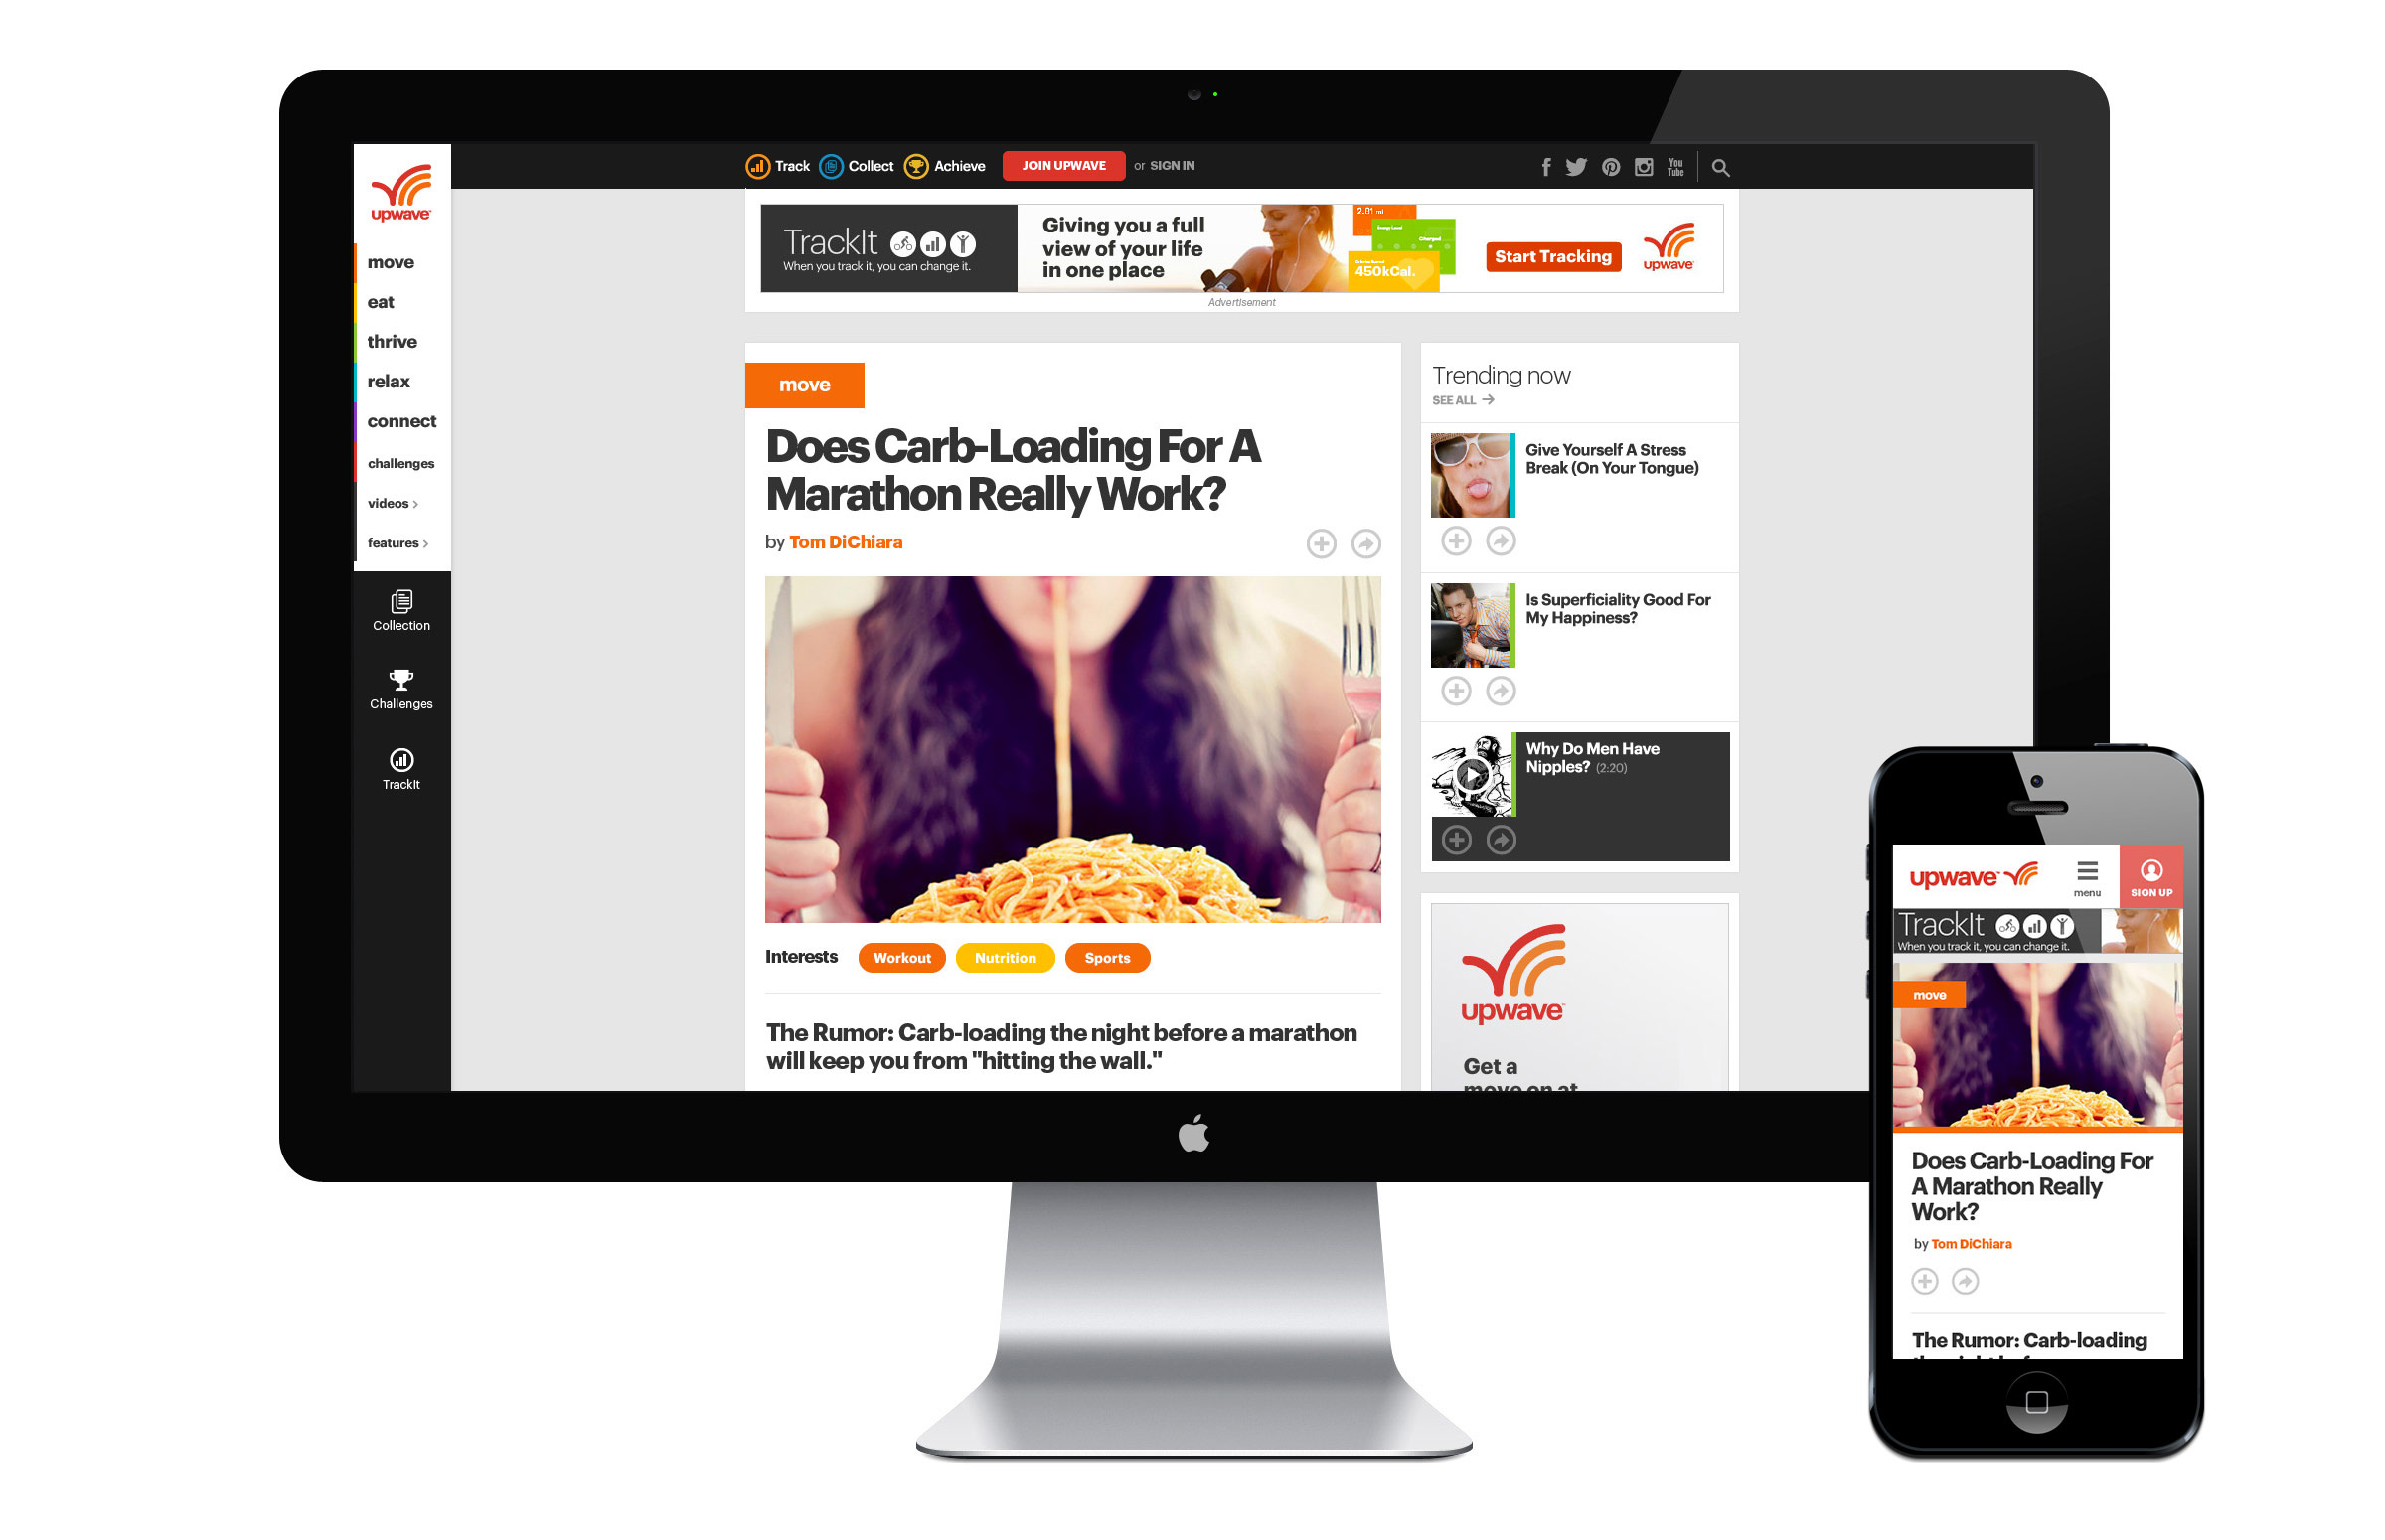 upwave_article_screens.jpg